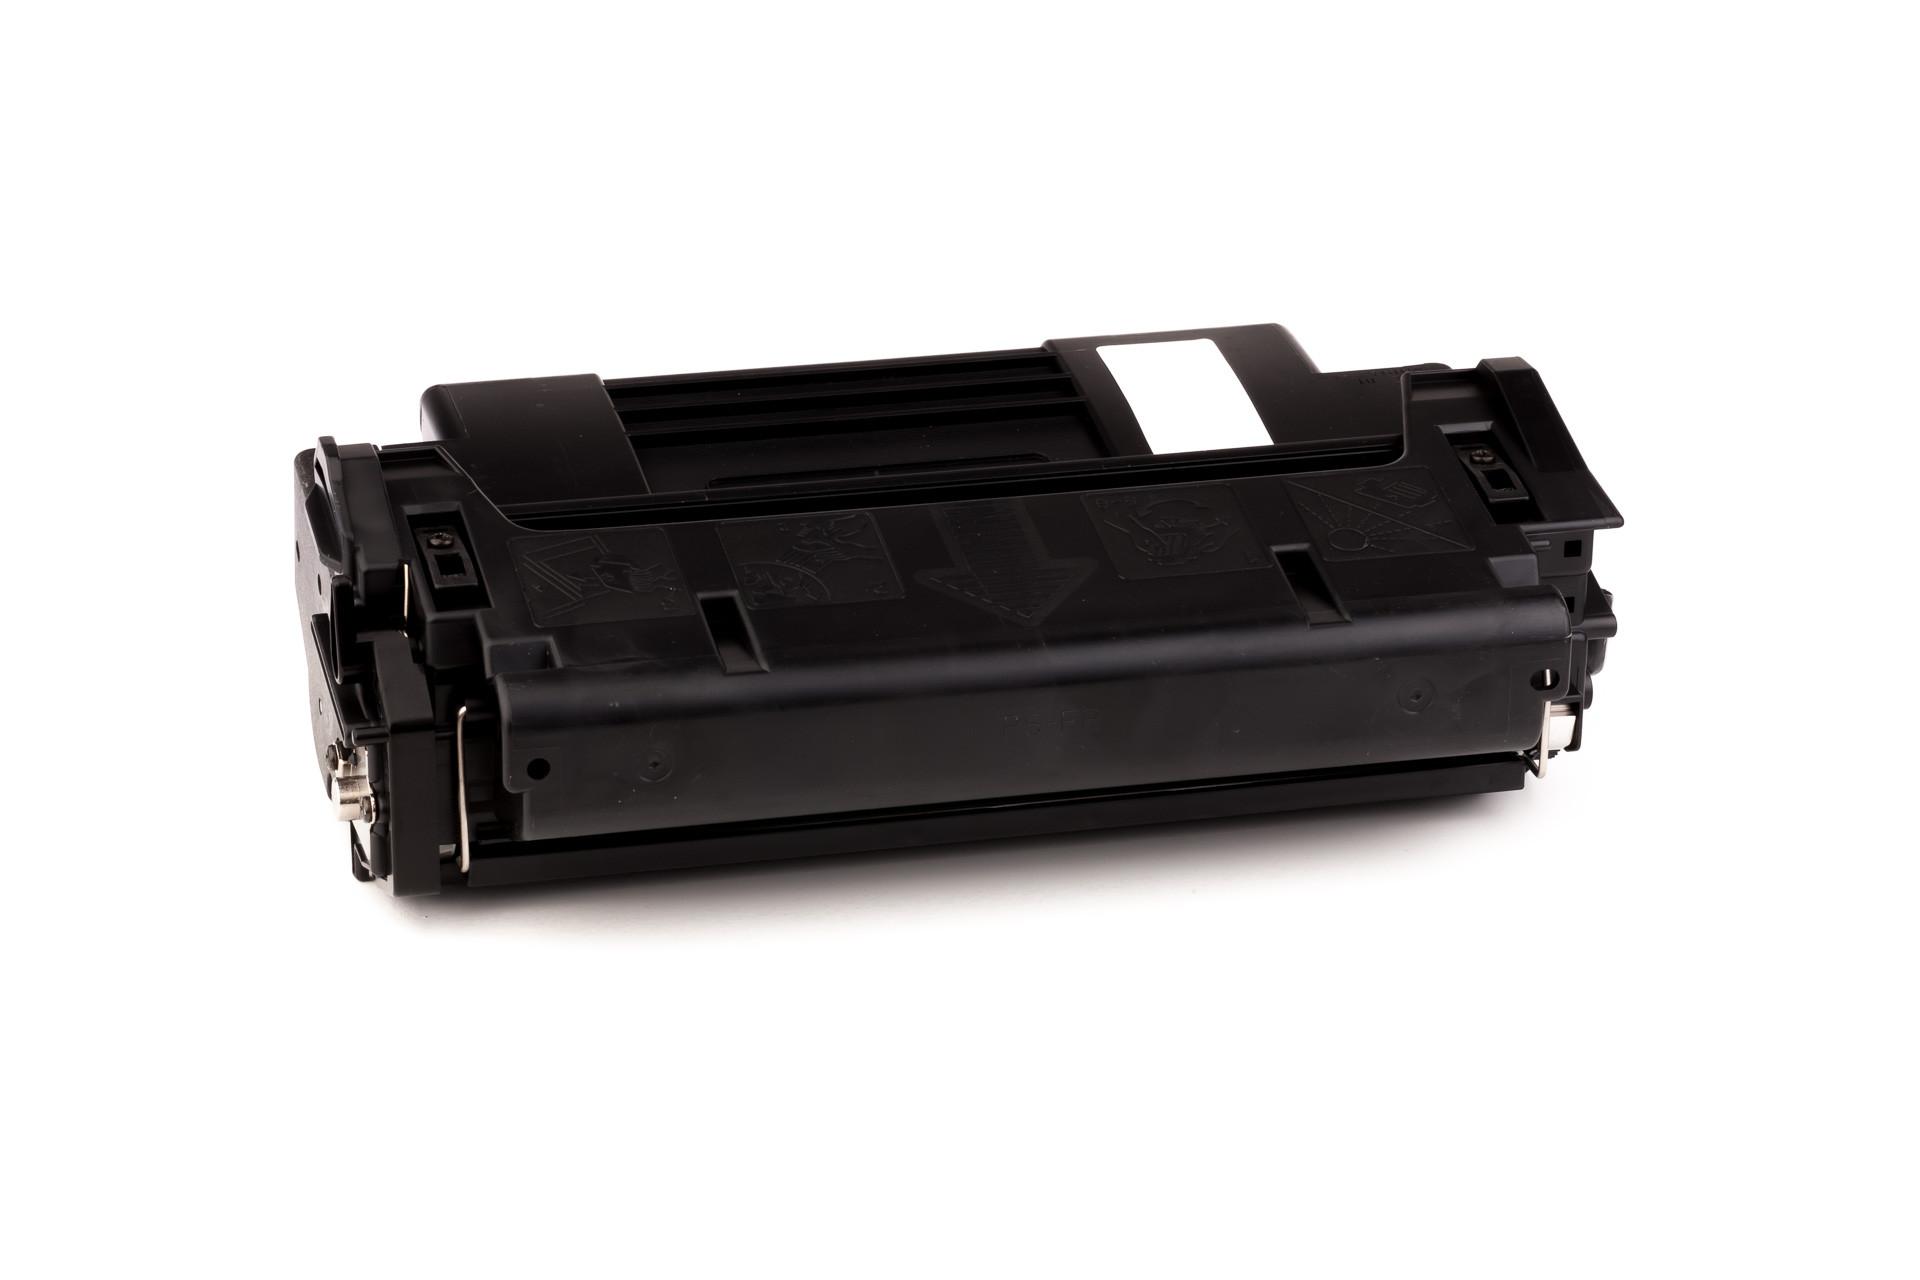 Toner cartridge (alternative) compatible with HP LJ 4 / 4 M / 4 M Plus / 4 MX / 4 Plus / 5 / 5 M / 5 N / 5 SE / Canon LBP-1260 / C / Plus / LBP-8 IV / LBP-8 Mark IV / LBP-EX / LBP-ZX / Brother TN-9000 // A-Version